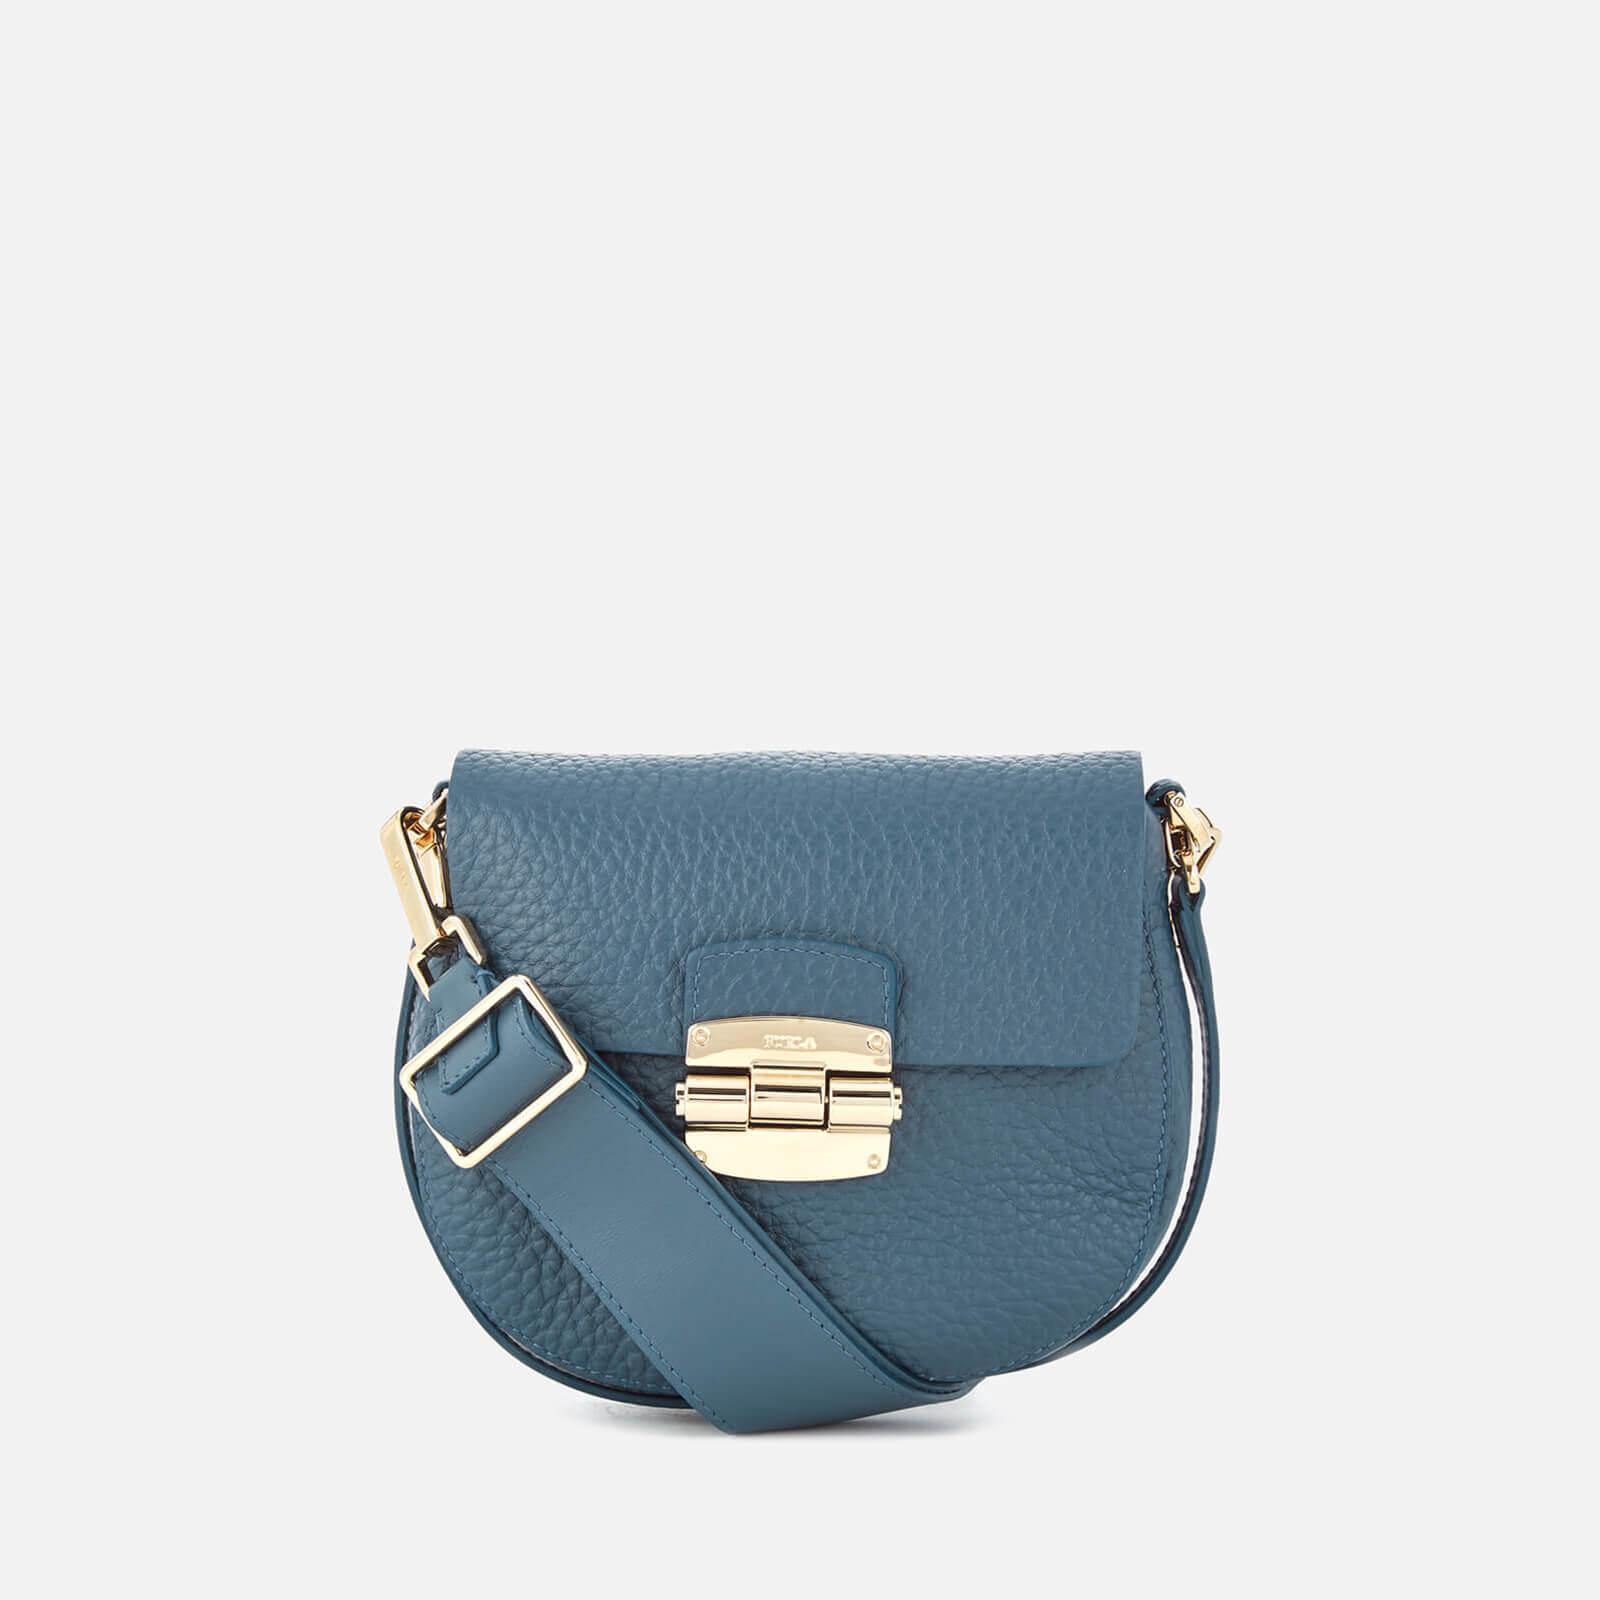 Furla Women's Club Mini Cross Body Bag - Blue - Free UK Delivery over £50